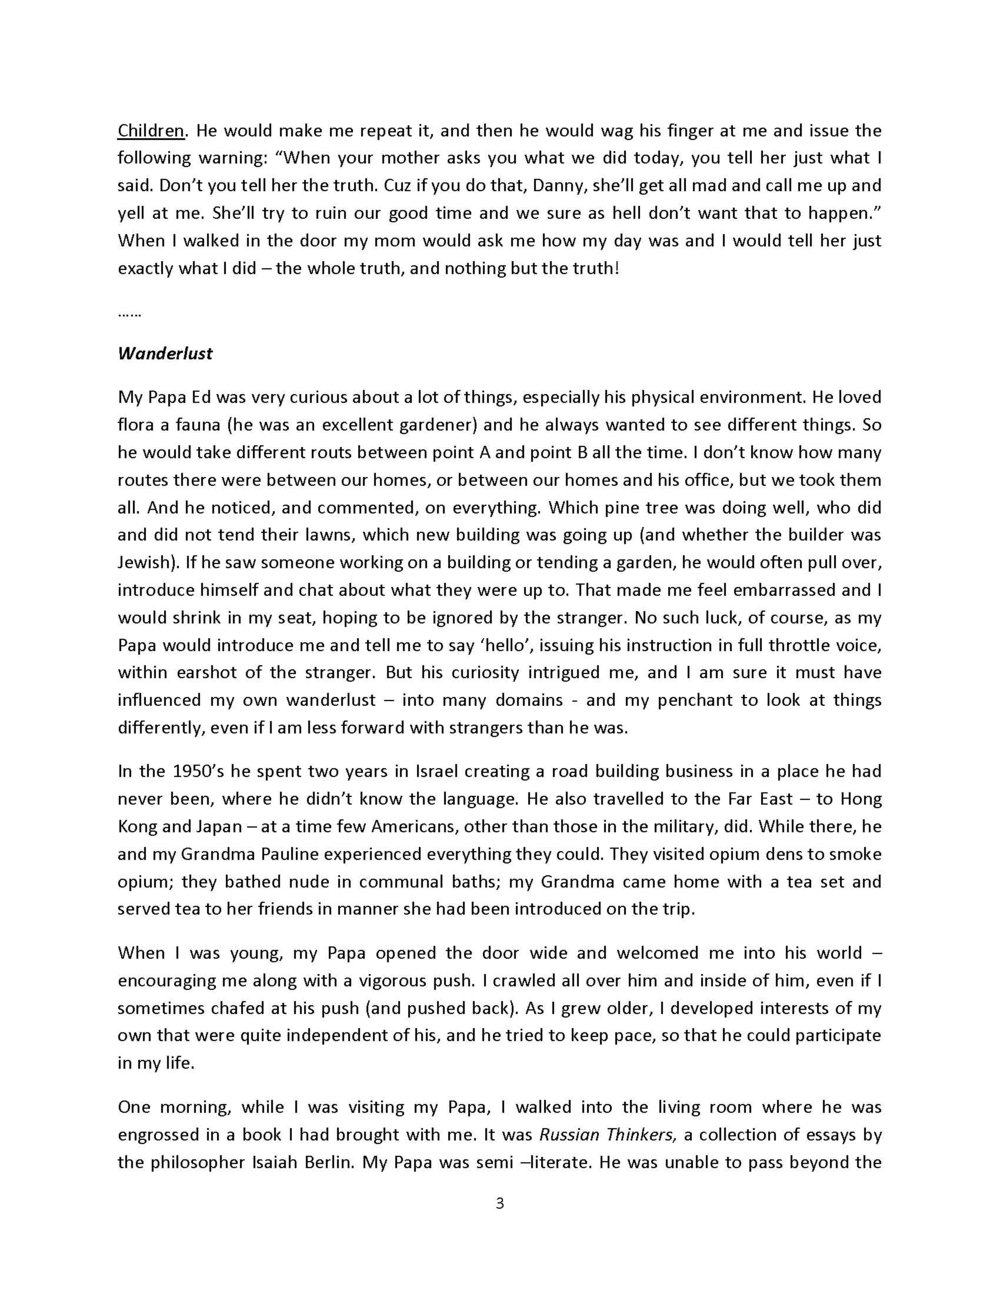 Papa Ed Stories -excerpts_Page_03.jpg